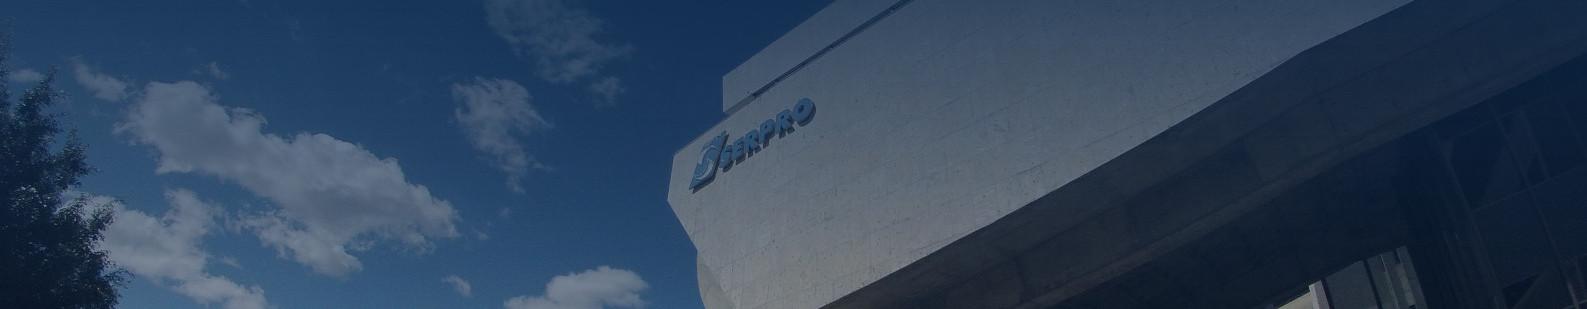 http://www.serpro.gov.br/menu/quem-somos/visite-o-serpro